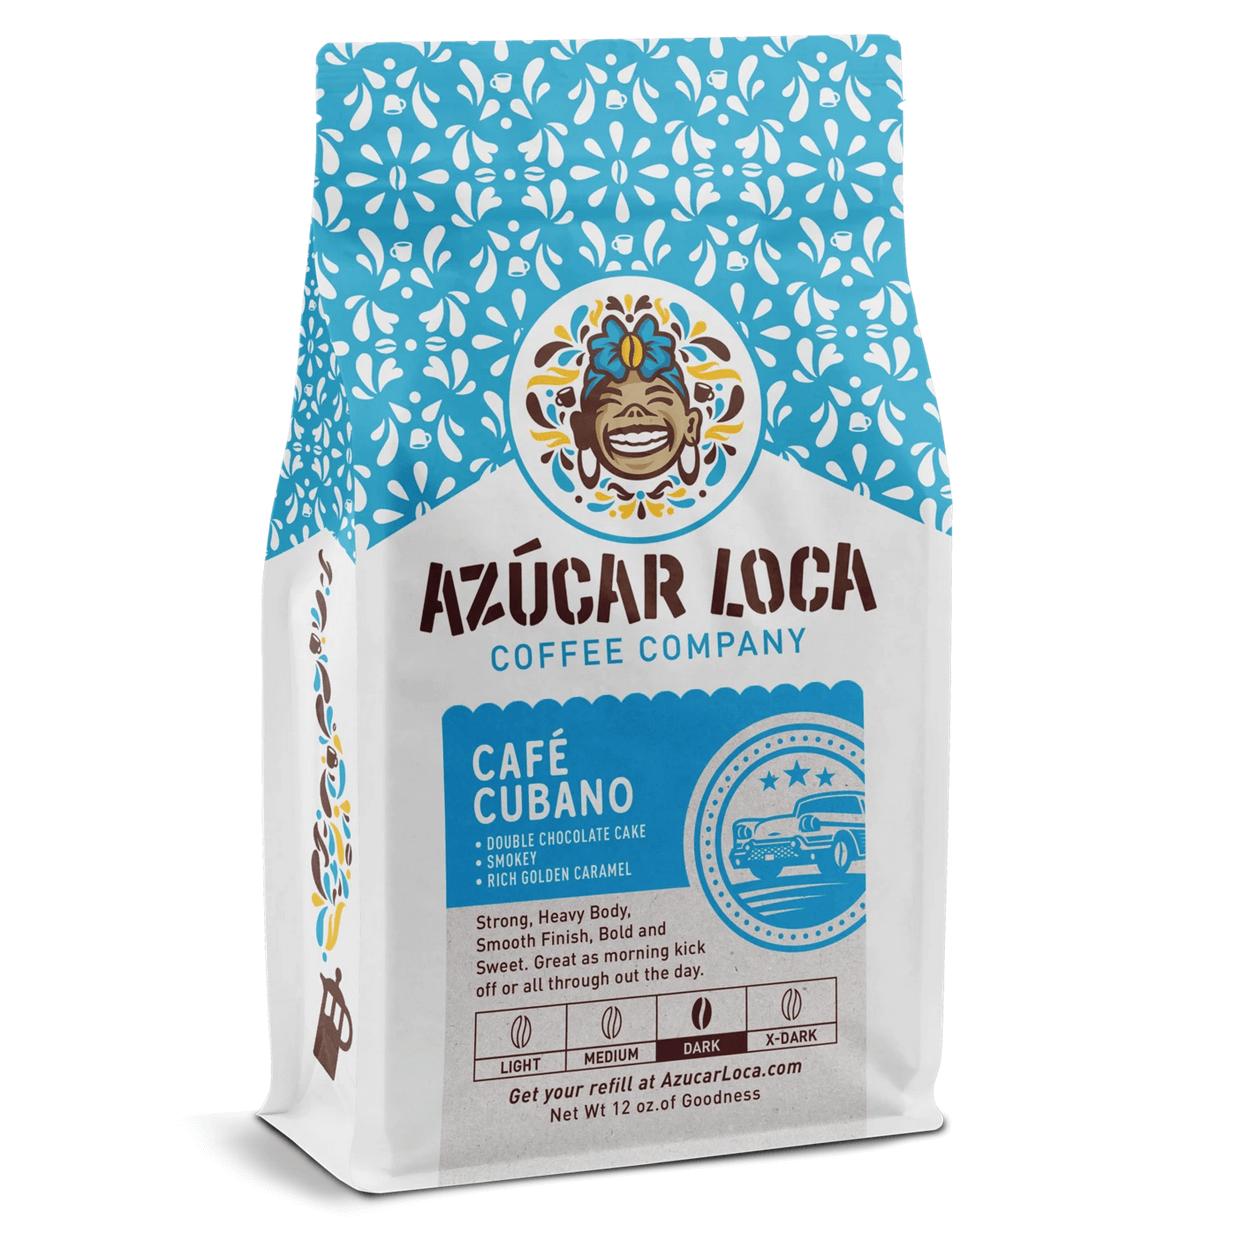 Café Cubano from Azucar Loca Coffee Company